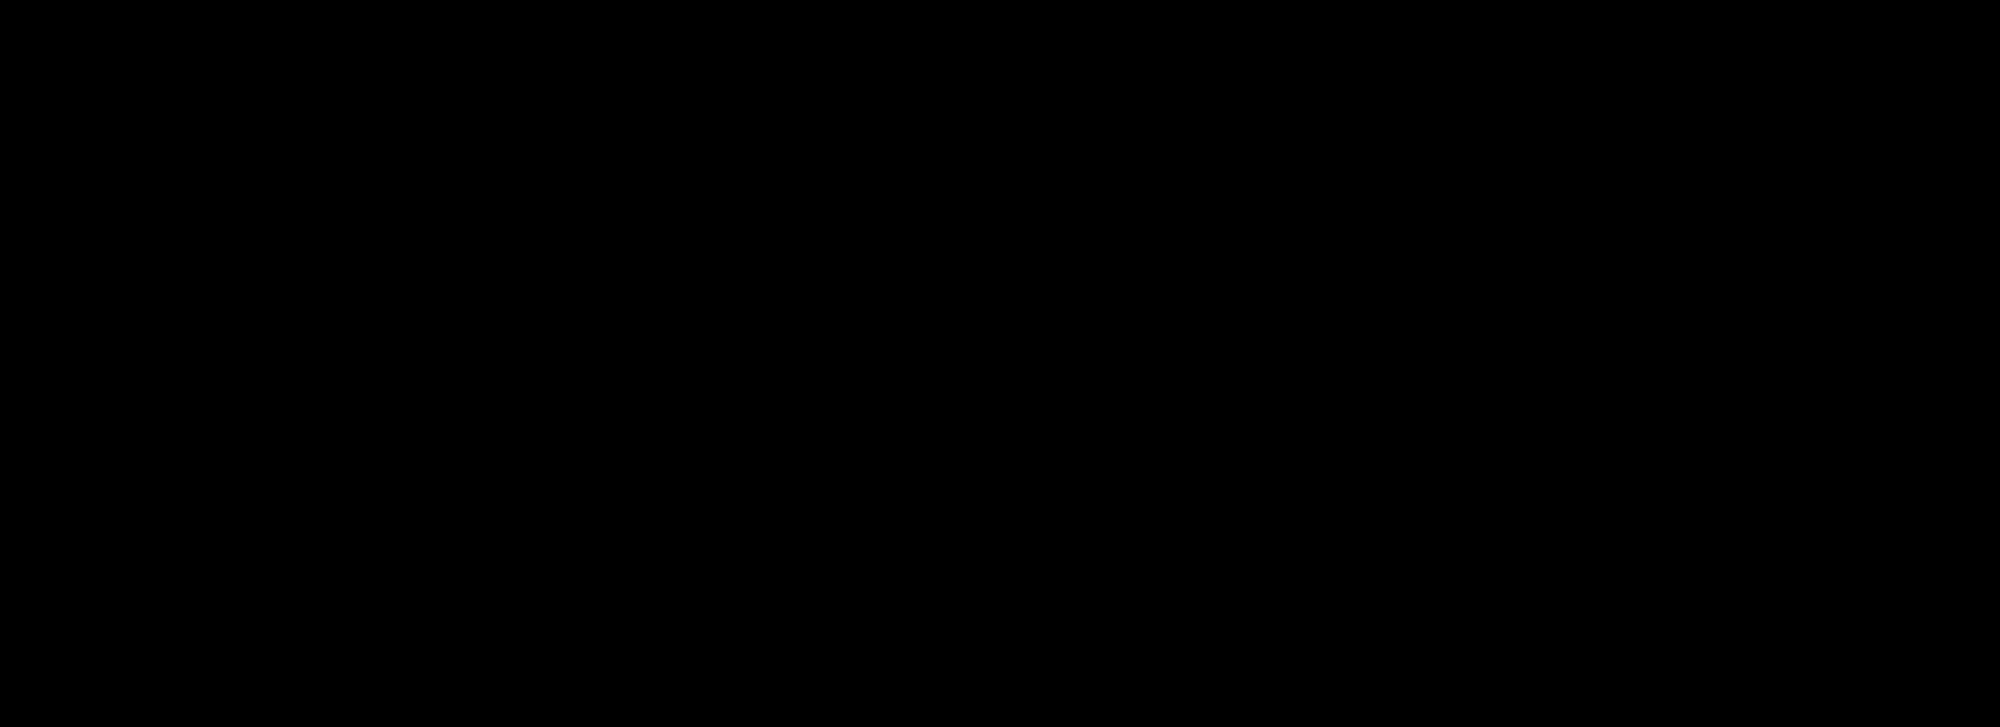 Brand-4